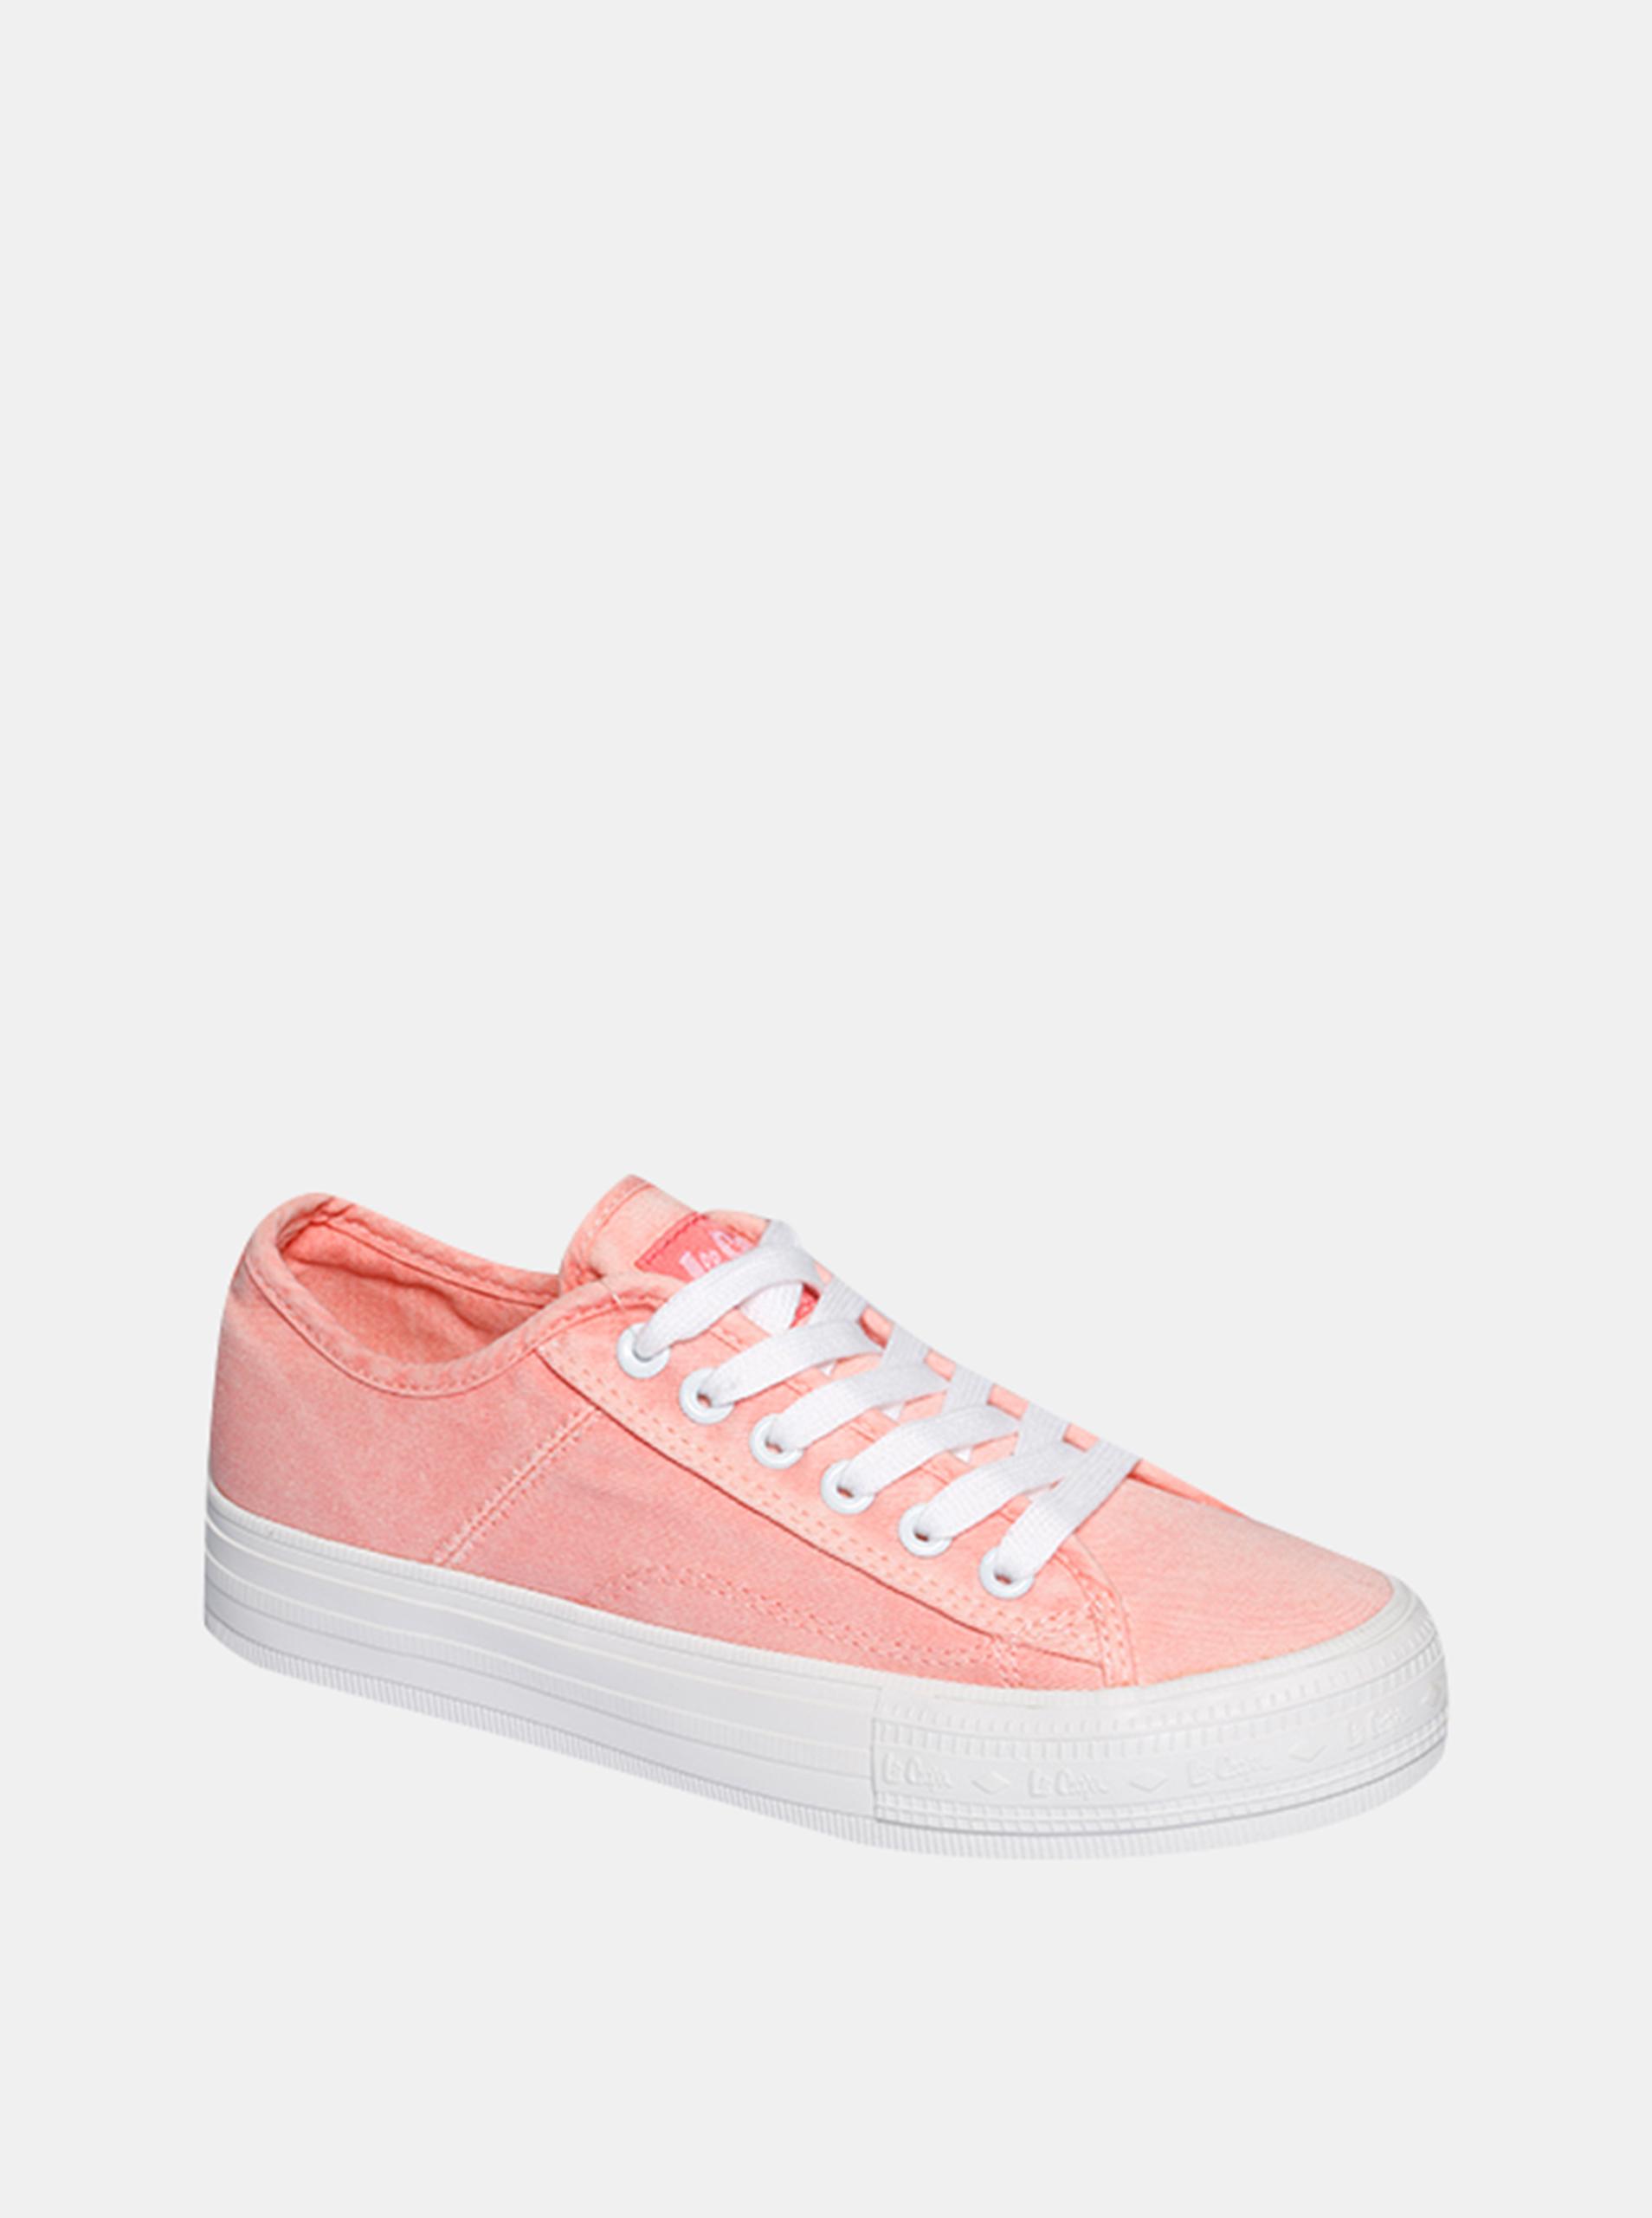 Ružové dámske tenisky Lee Cooper - 41